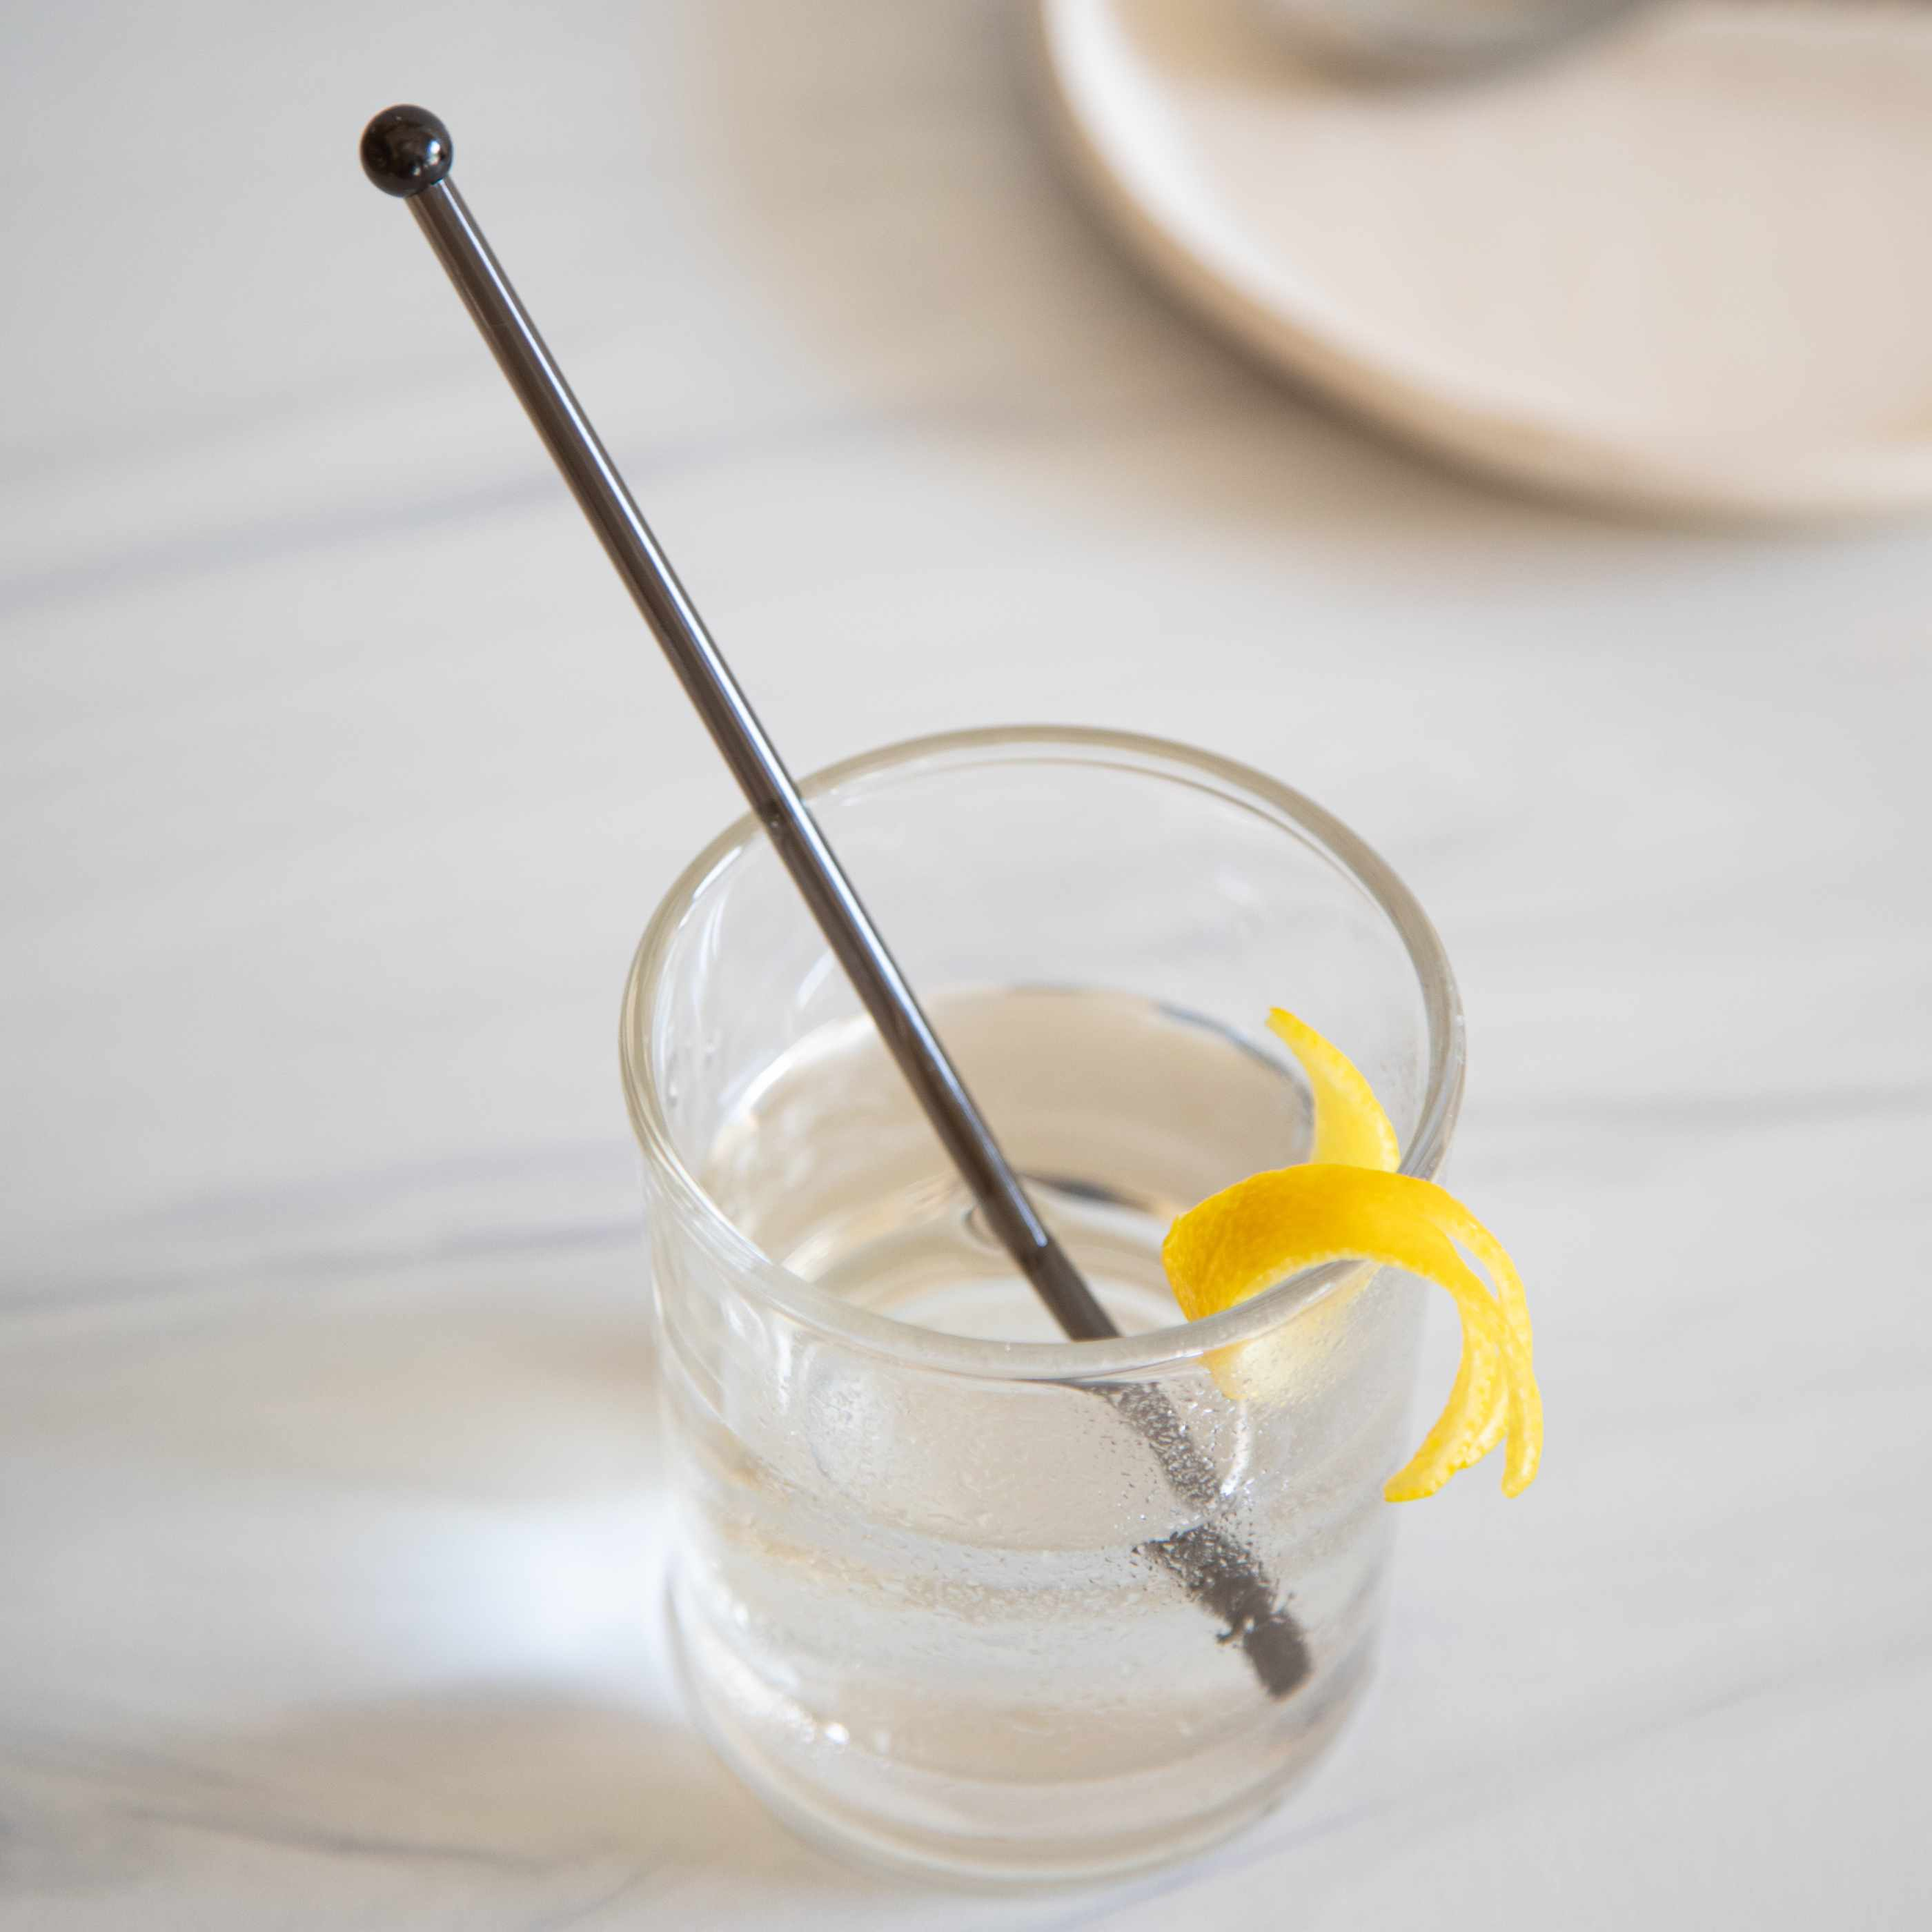 50/50 Gin Martini with a stir stick and lemon peel garnish.